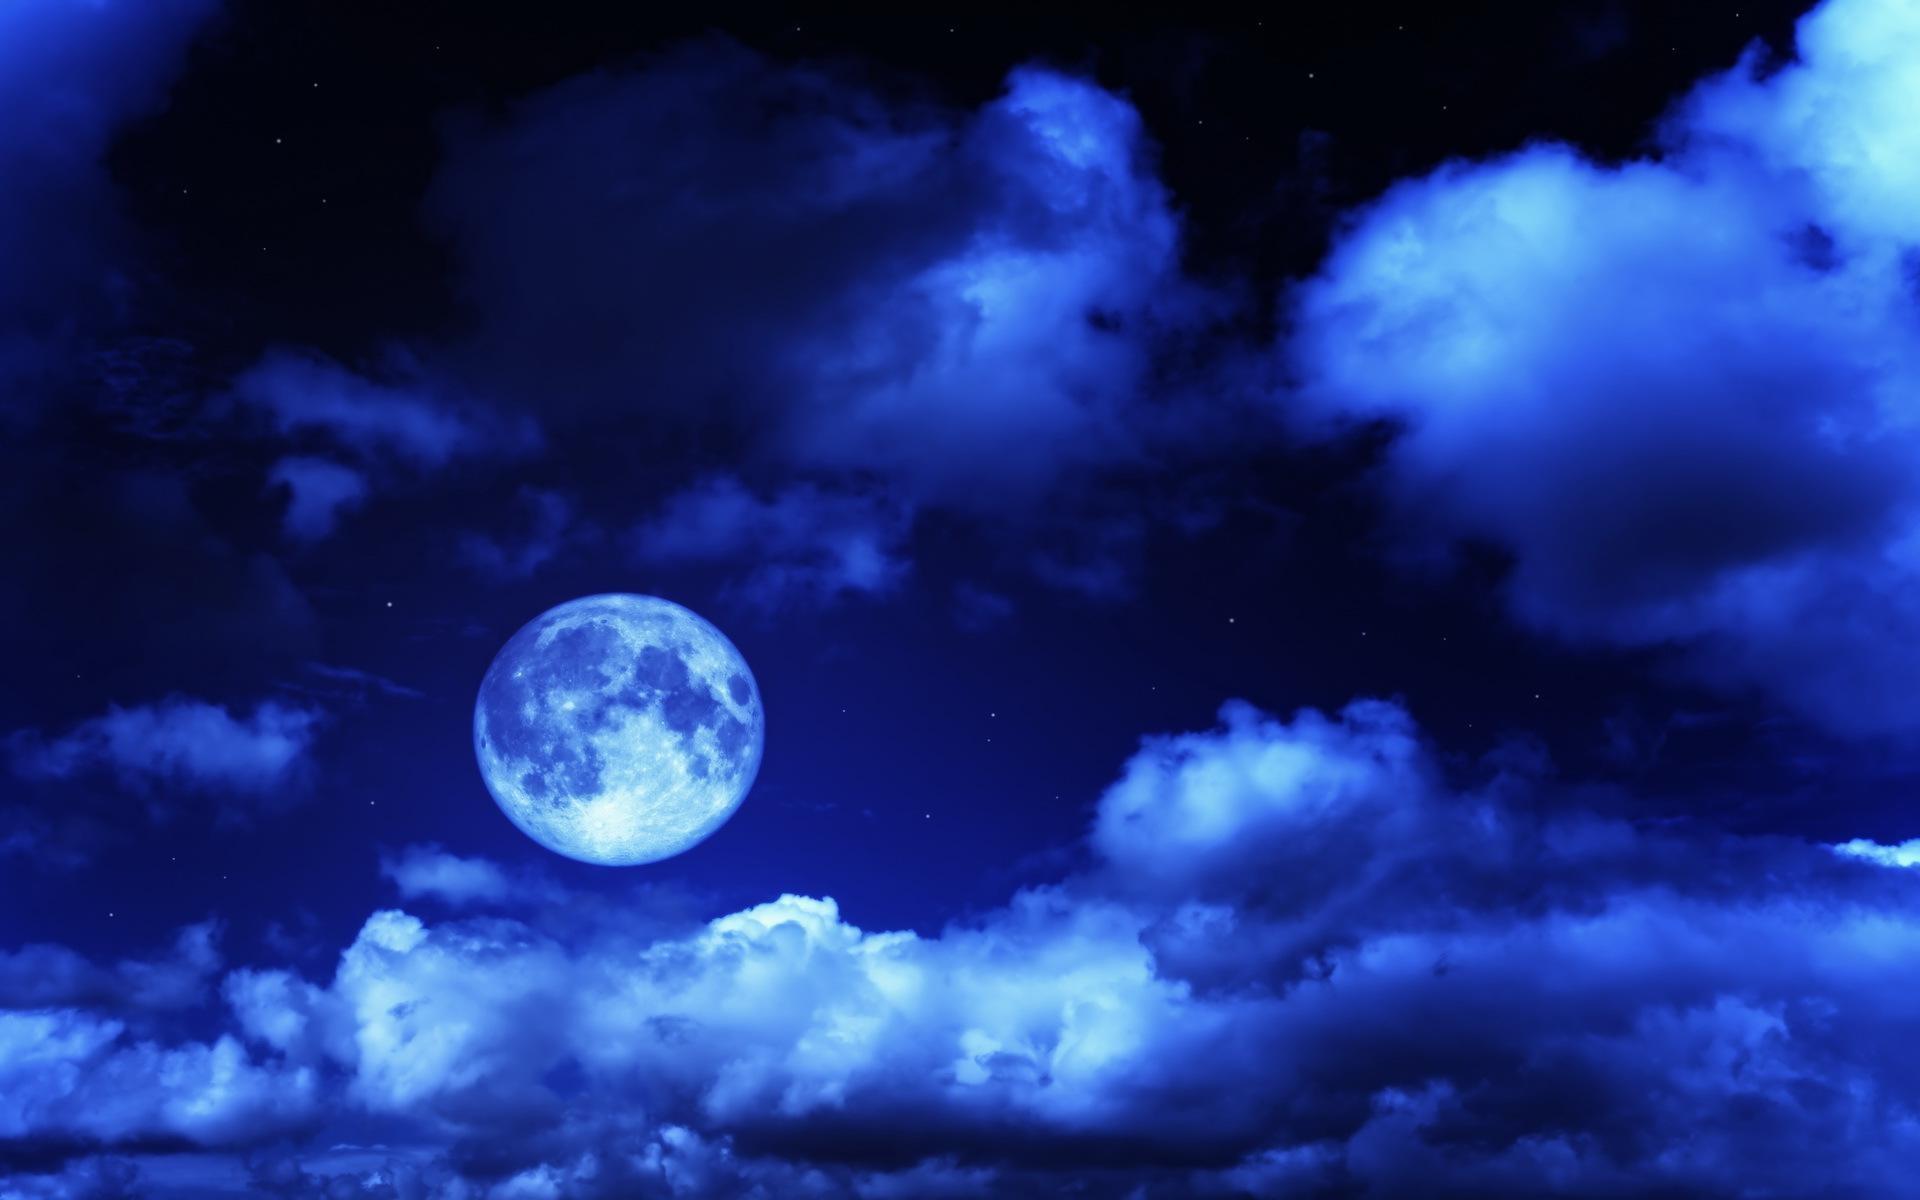 Blue Moon Wallpaper 63 Images